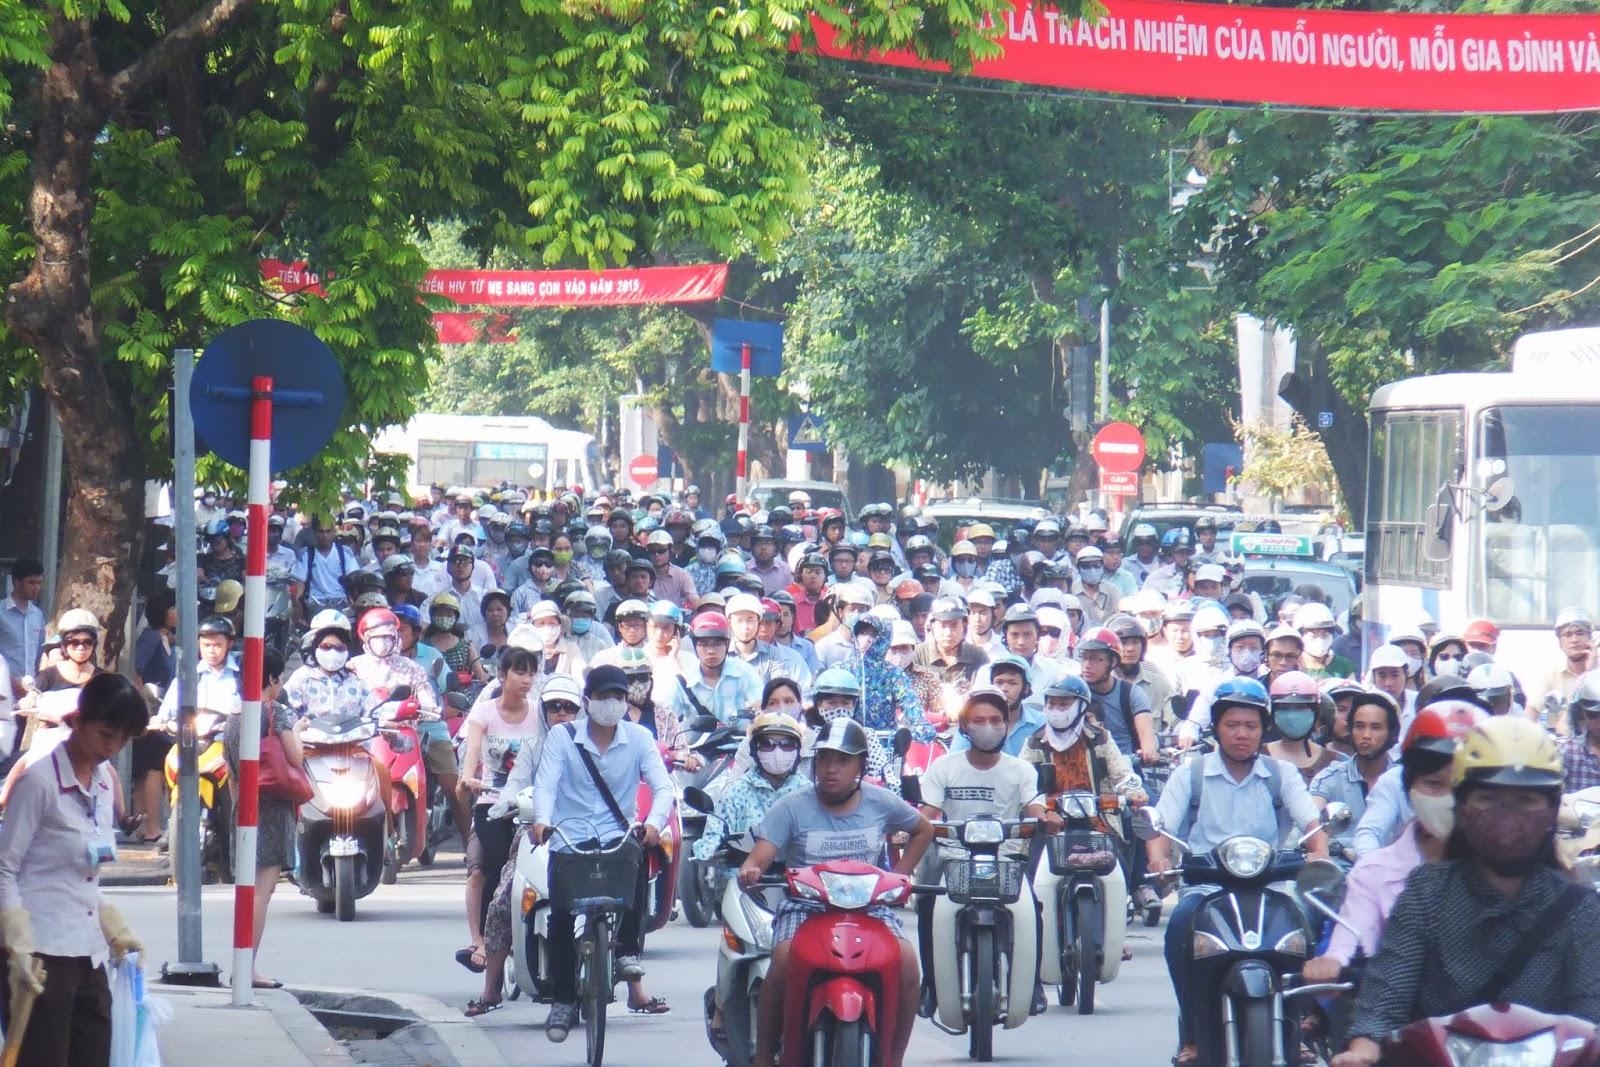 traffic-jam-bymotorcycle ハノイのバイク群